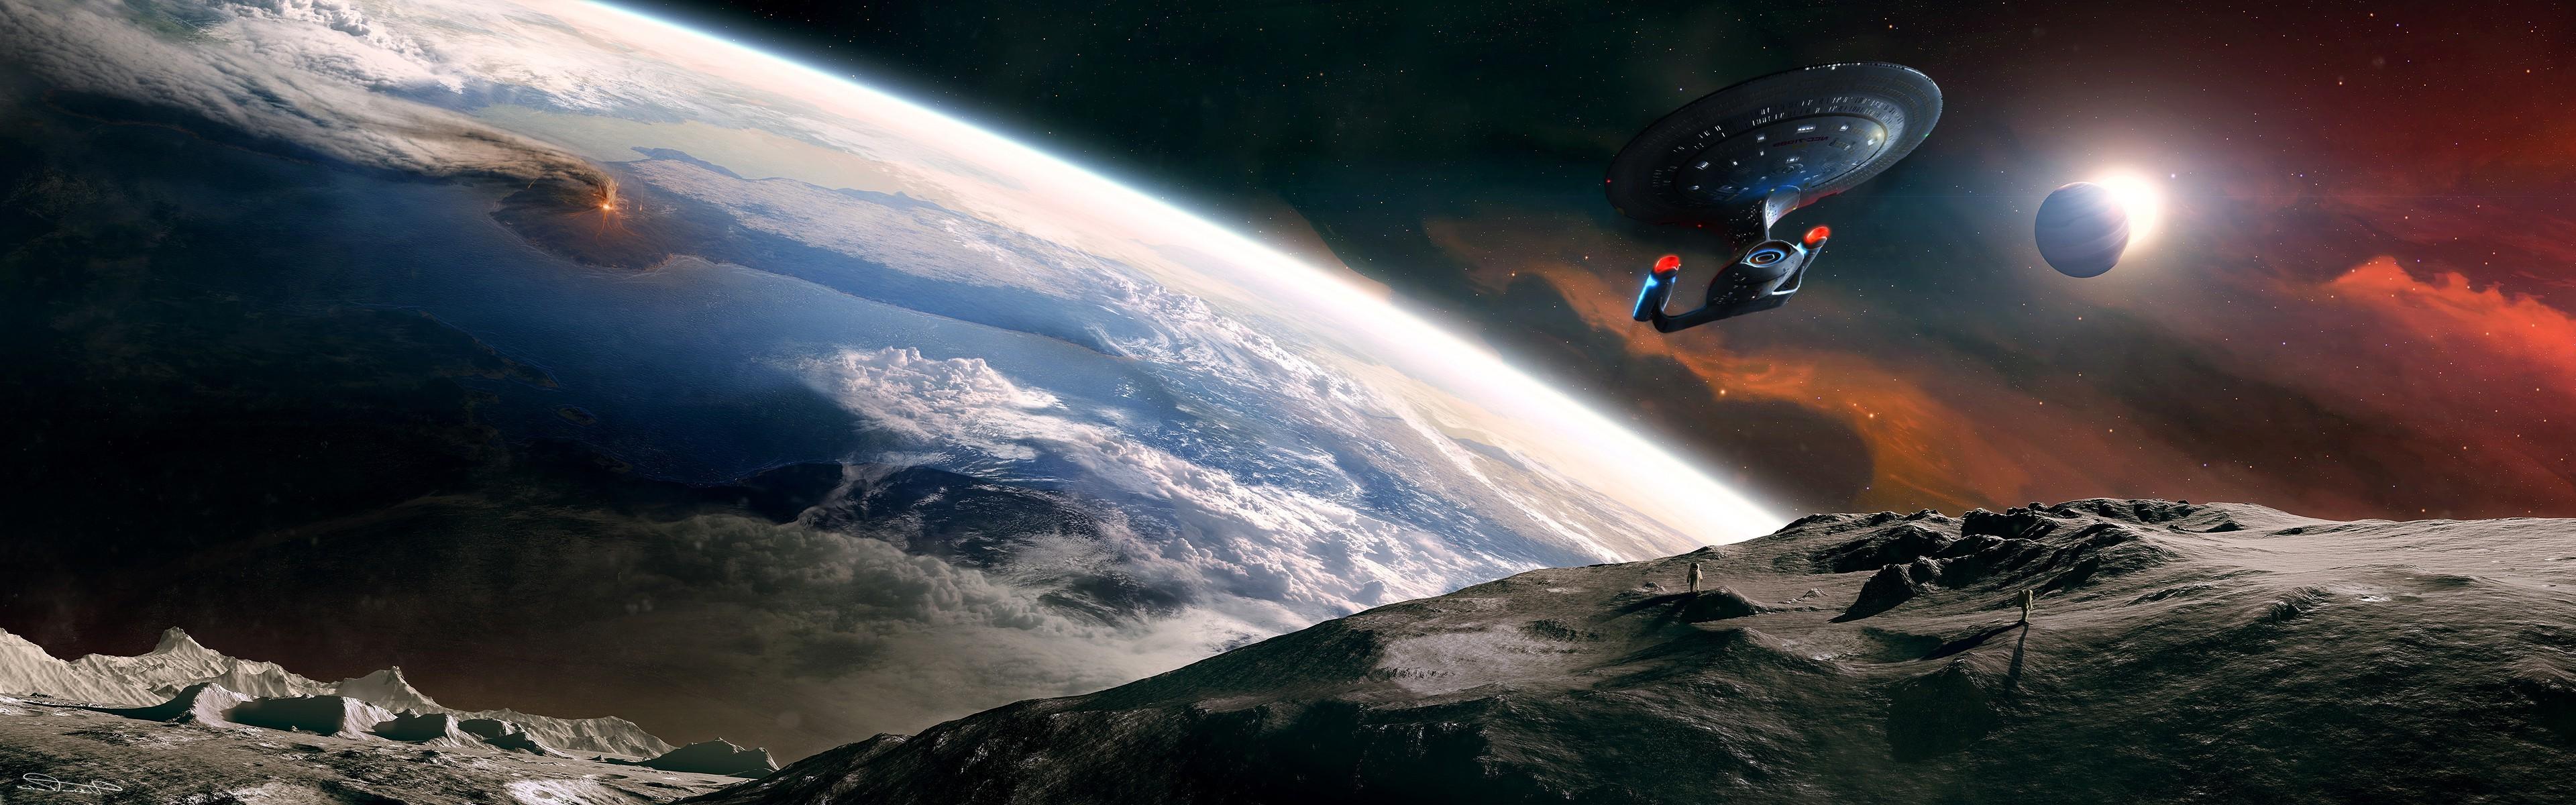 Wallpaper 3840x1200 Px Planet Space Spaceship Star Trek